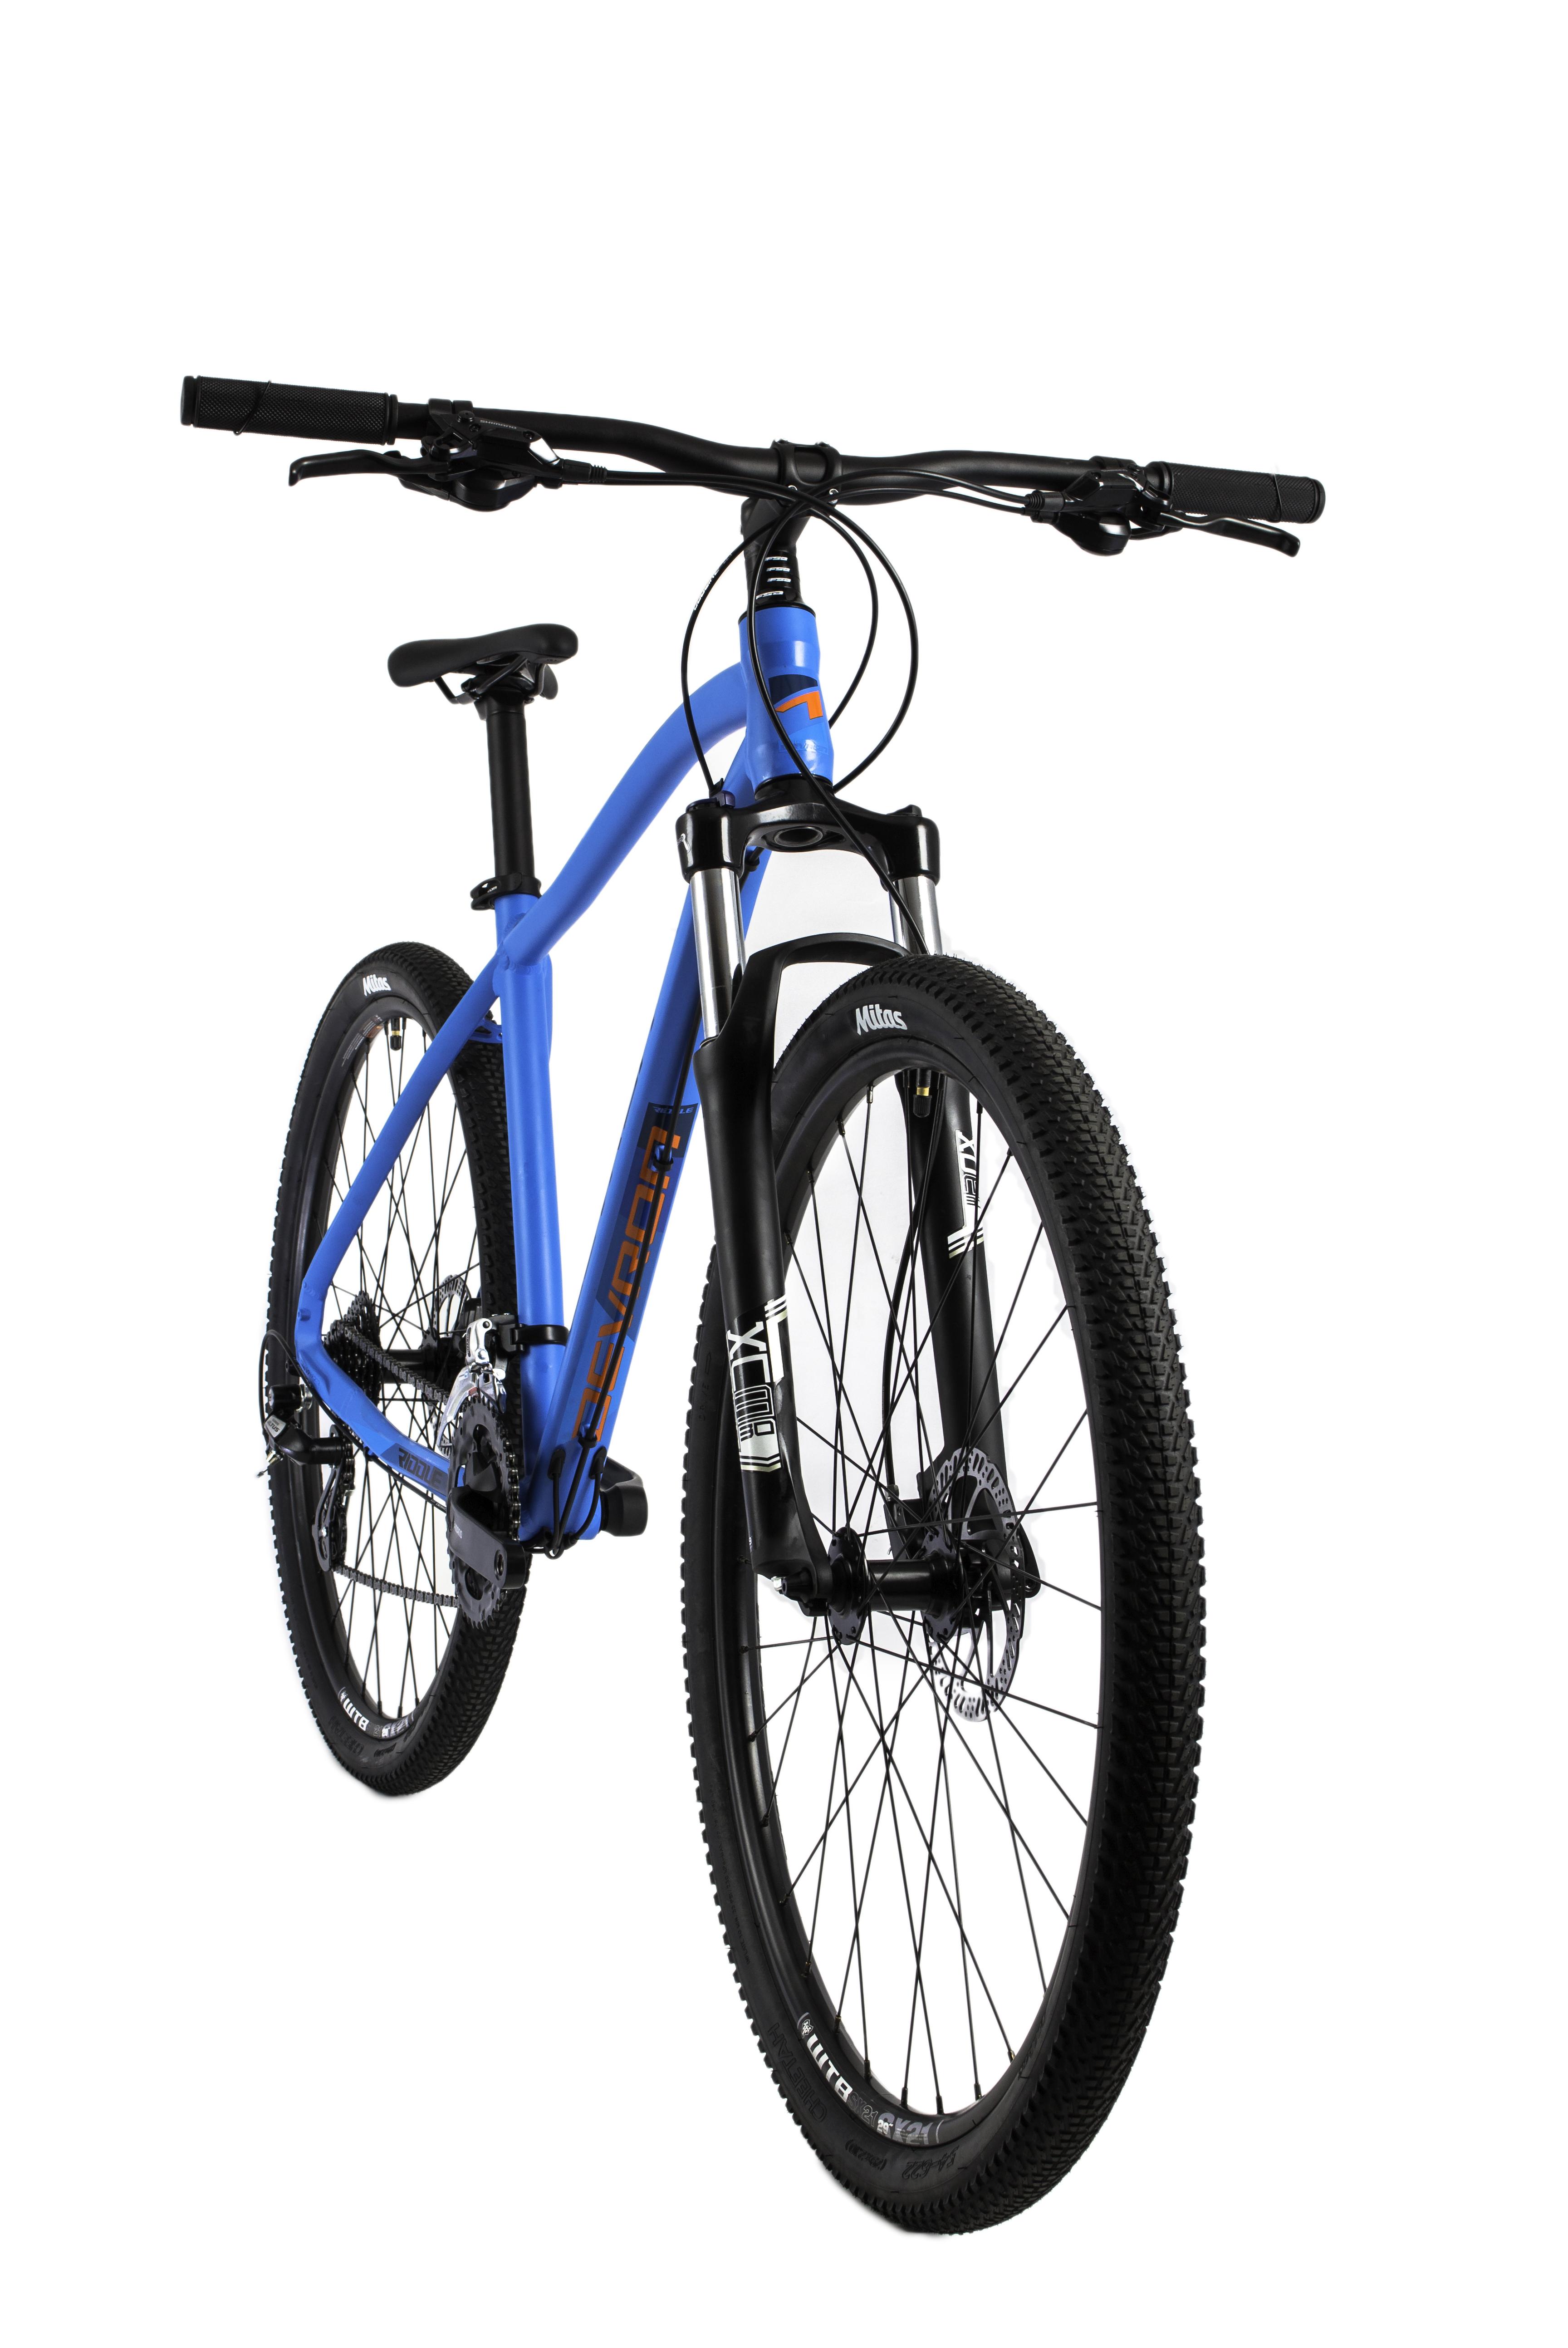 Bicicleta Mtb Devron Riddle M1.9 Xl 540Mm Verde Glossy 29 Inch4